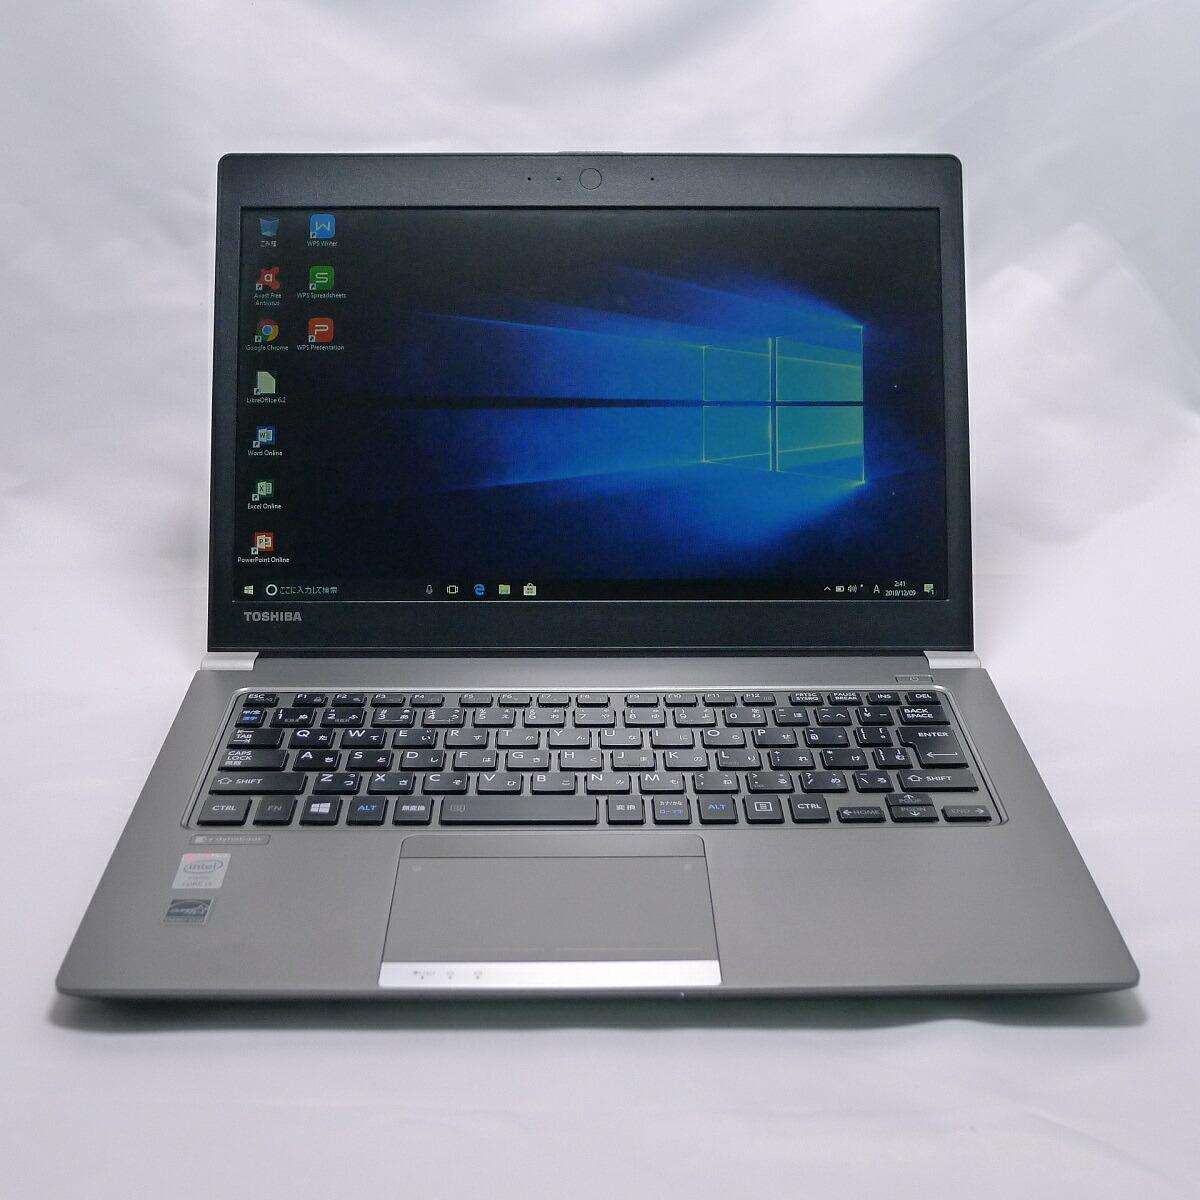 TOSHIBA dynabook R634 Core i5 8GB SSD120GB 無線LAN Windows10 64bitWPSOffice 13.3インチ モバイルノート 中古 中古パソコン 【中古】 ノートパソコン